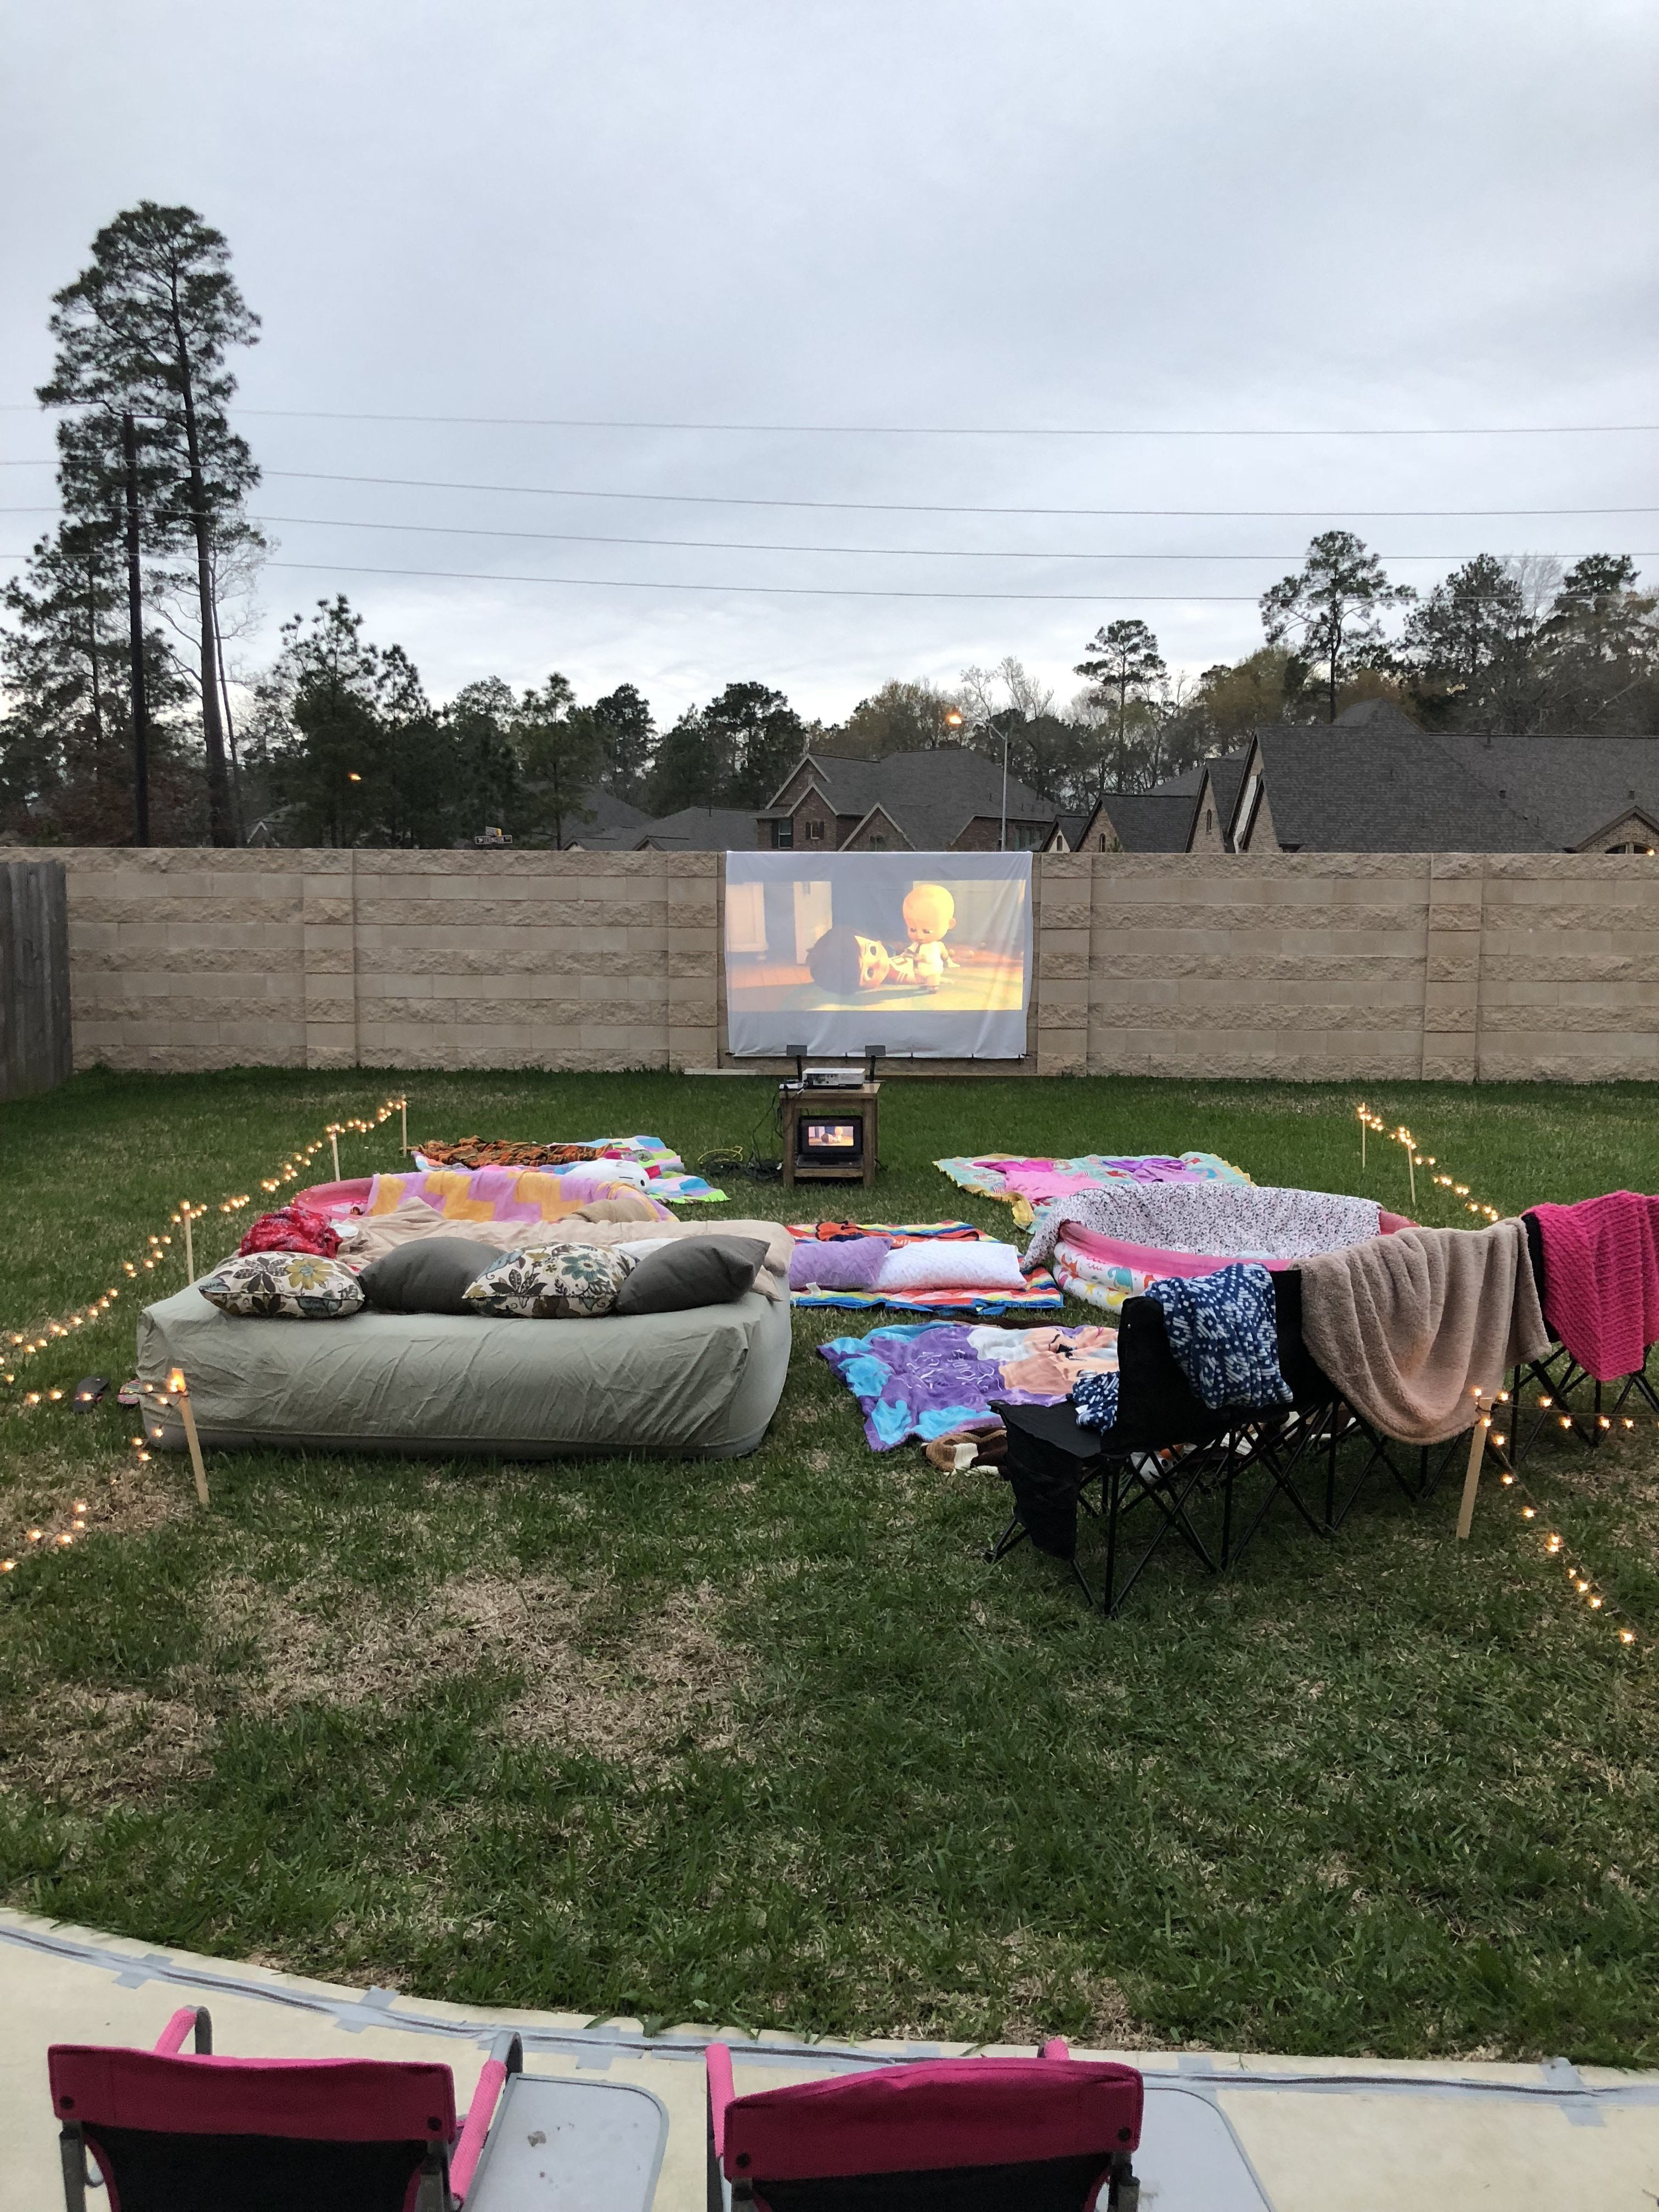 17th Birthday Party Ideas Winter Backyard Movie Birthday Party Backyard Camping Parties Backyard Movie Party Backyard Movie Nights